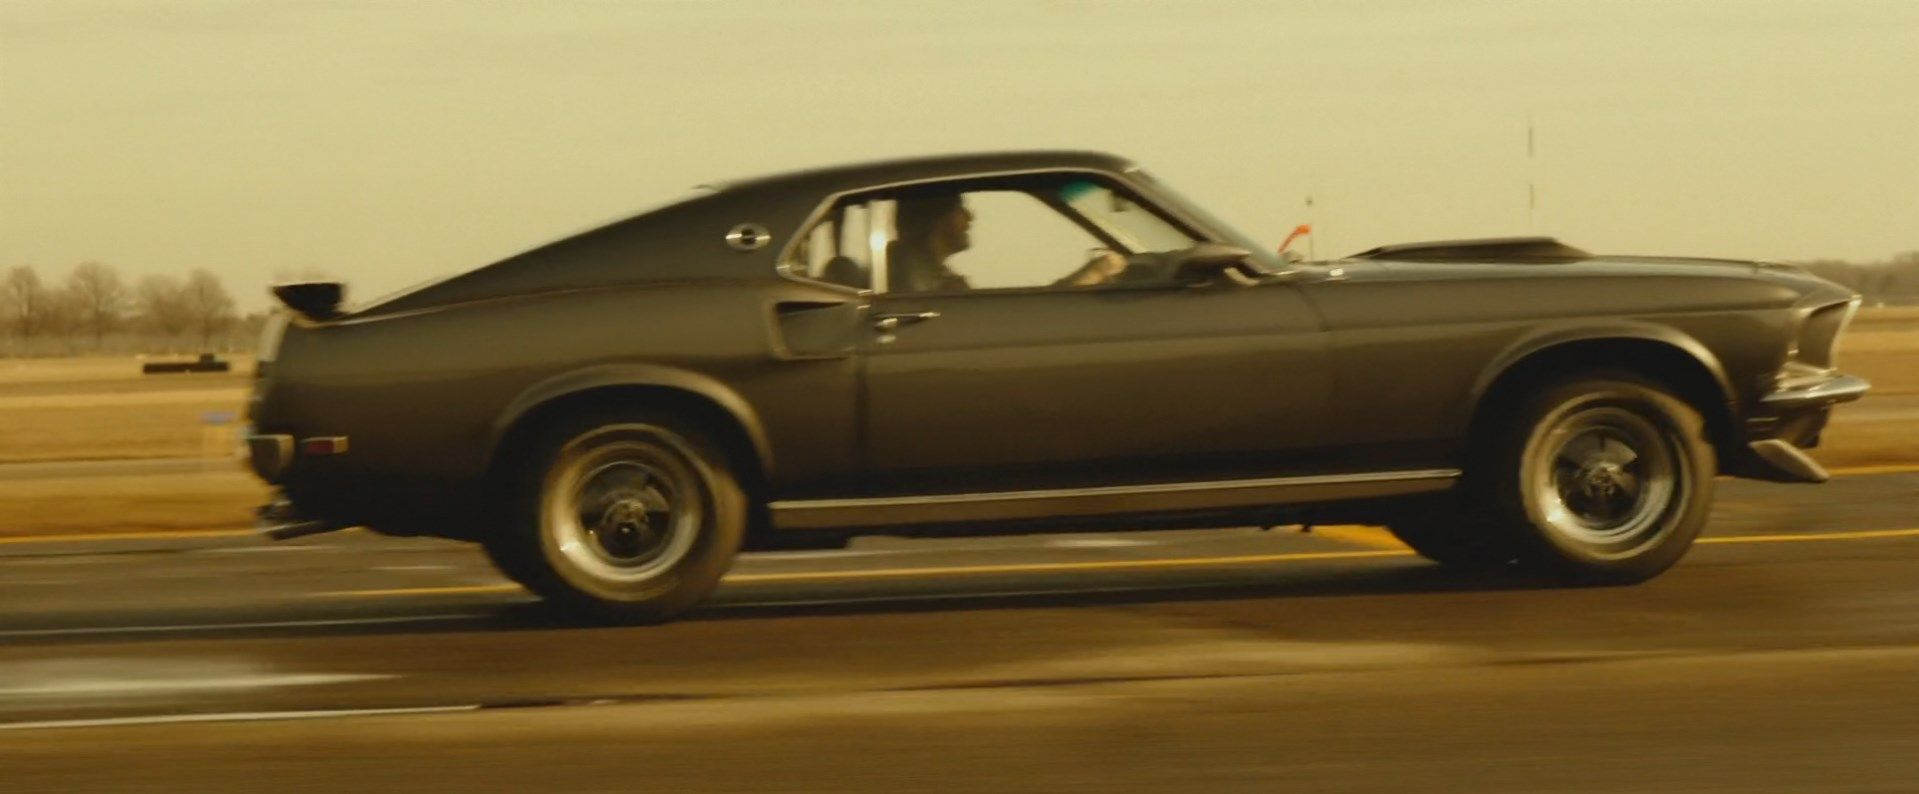 Image For John Wick Car Mustang Cars Movie John Wick Car Mustang